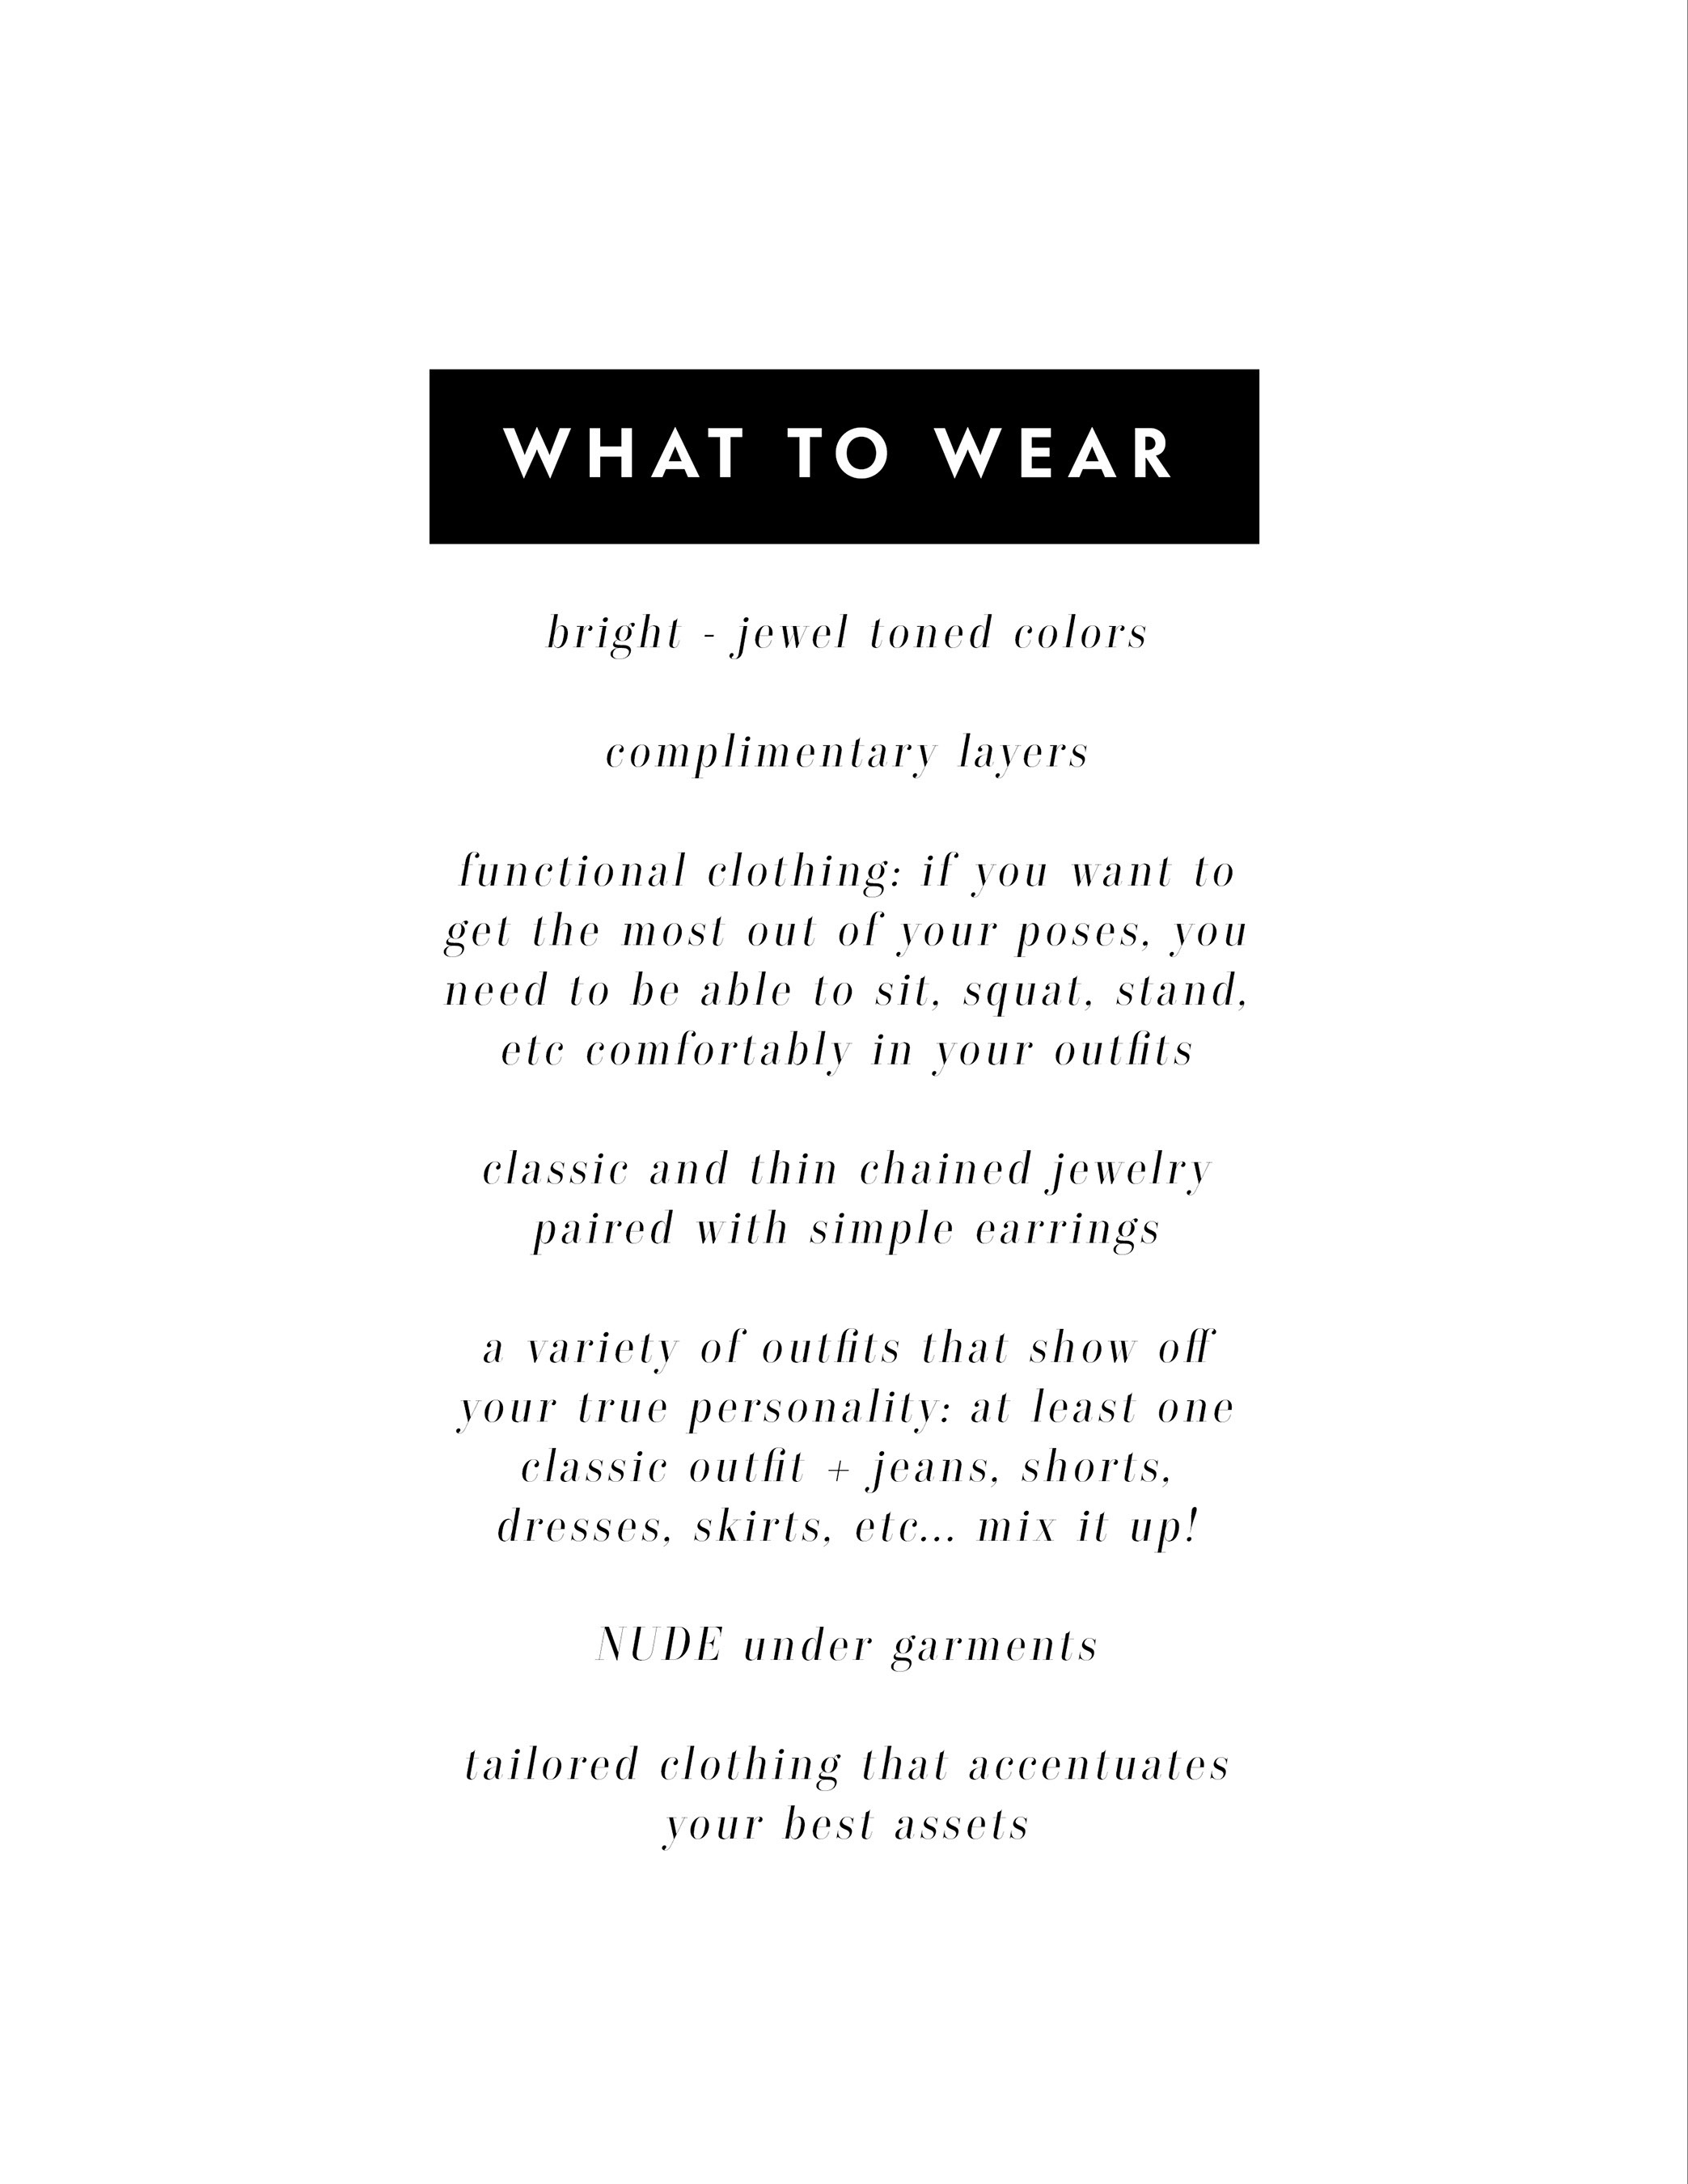 What to Wear Guide - Digital PDF-2-Left.jpg